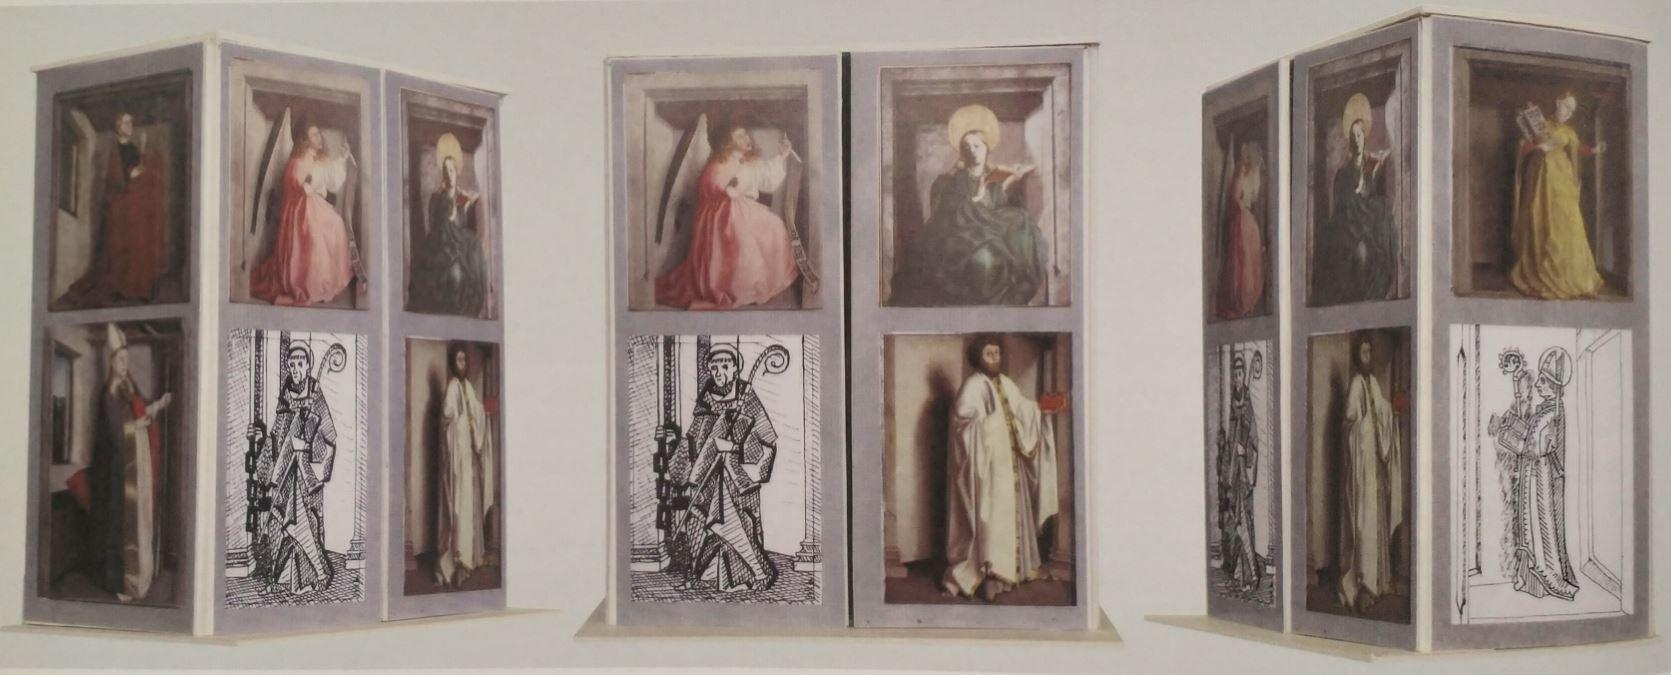 1435 konrad Witz retable du Miroir du Salut Musee des BA Dijon Reconstruction Catalogue expo Bale